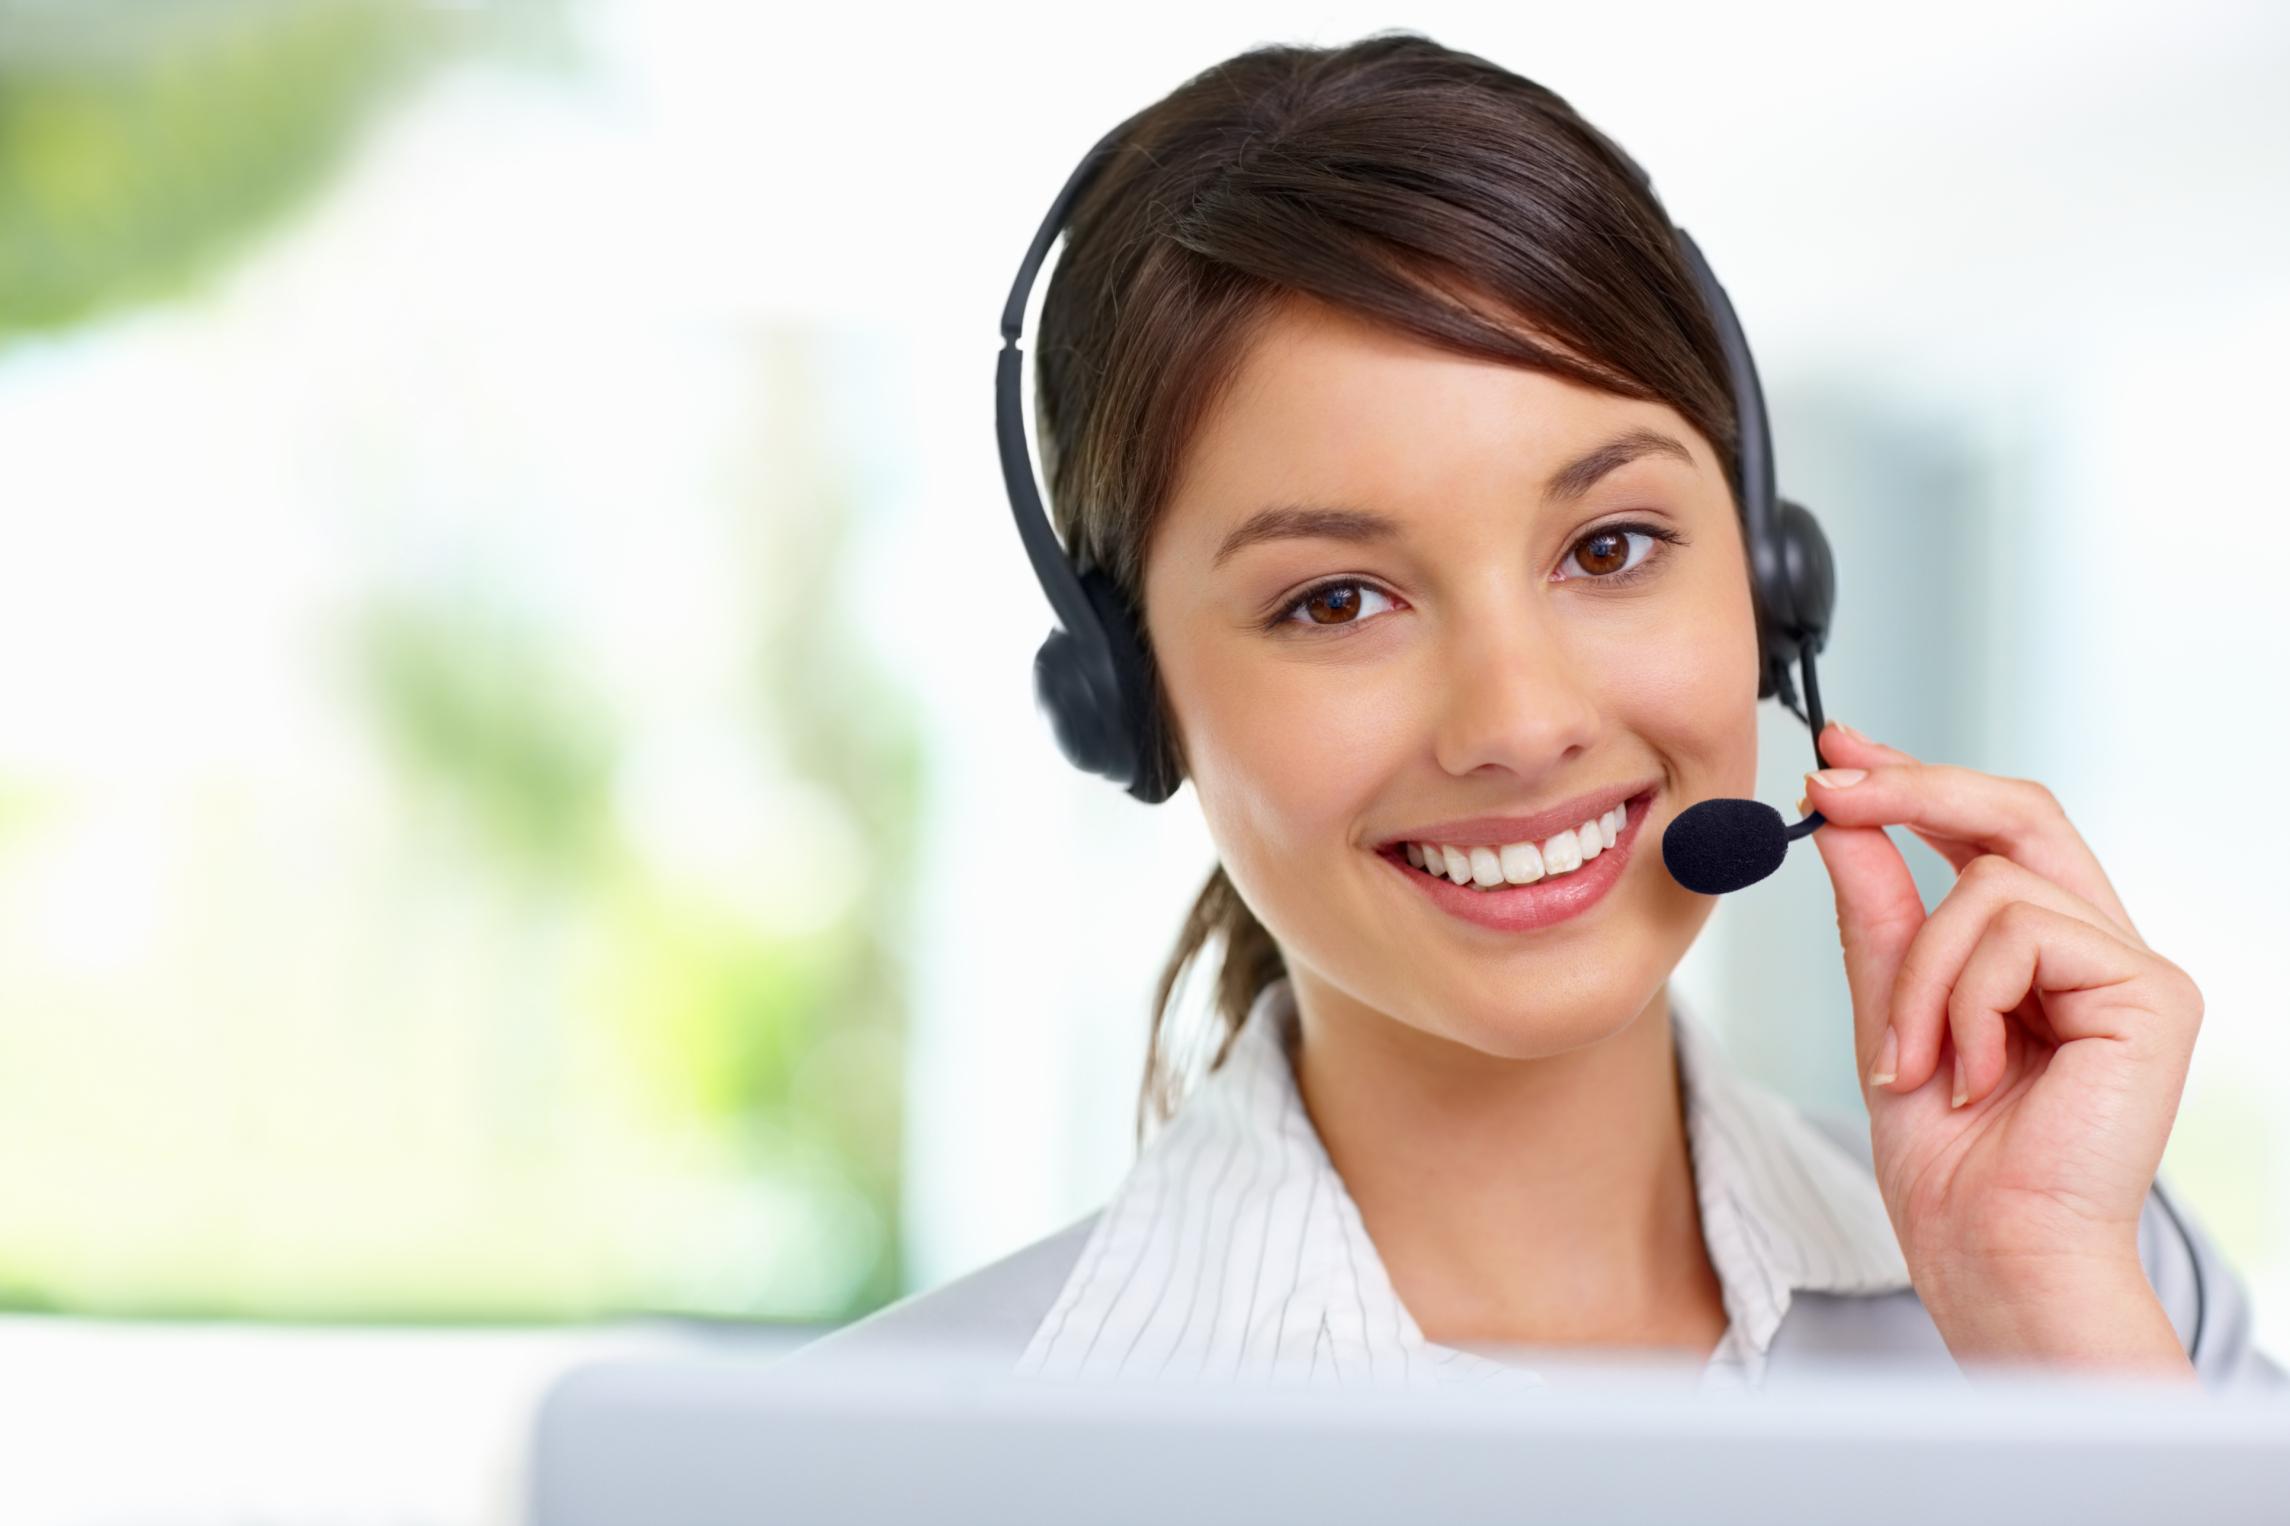 Pantaeva call girl at work nude self